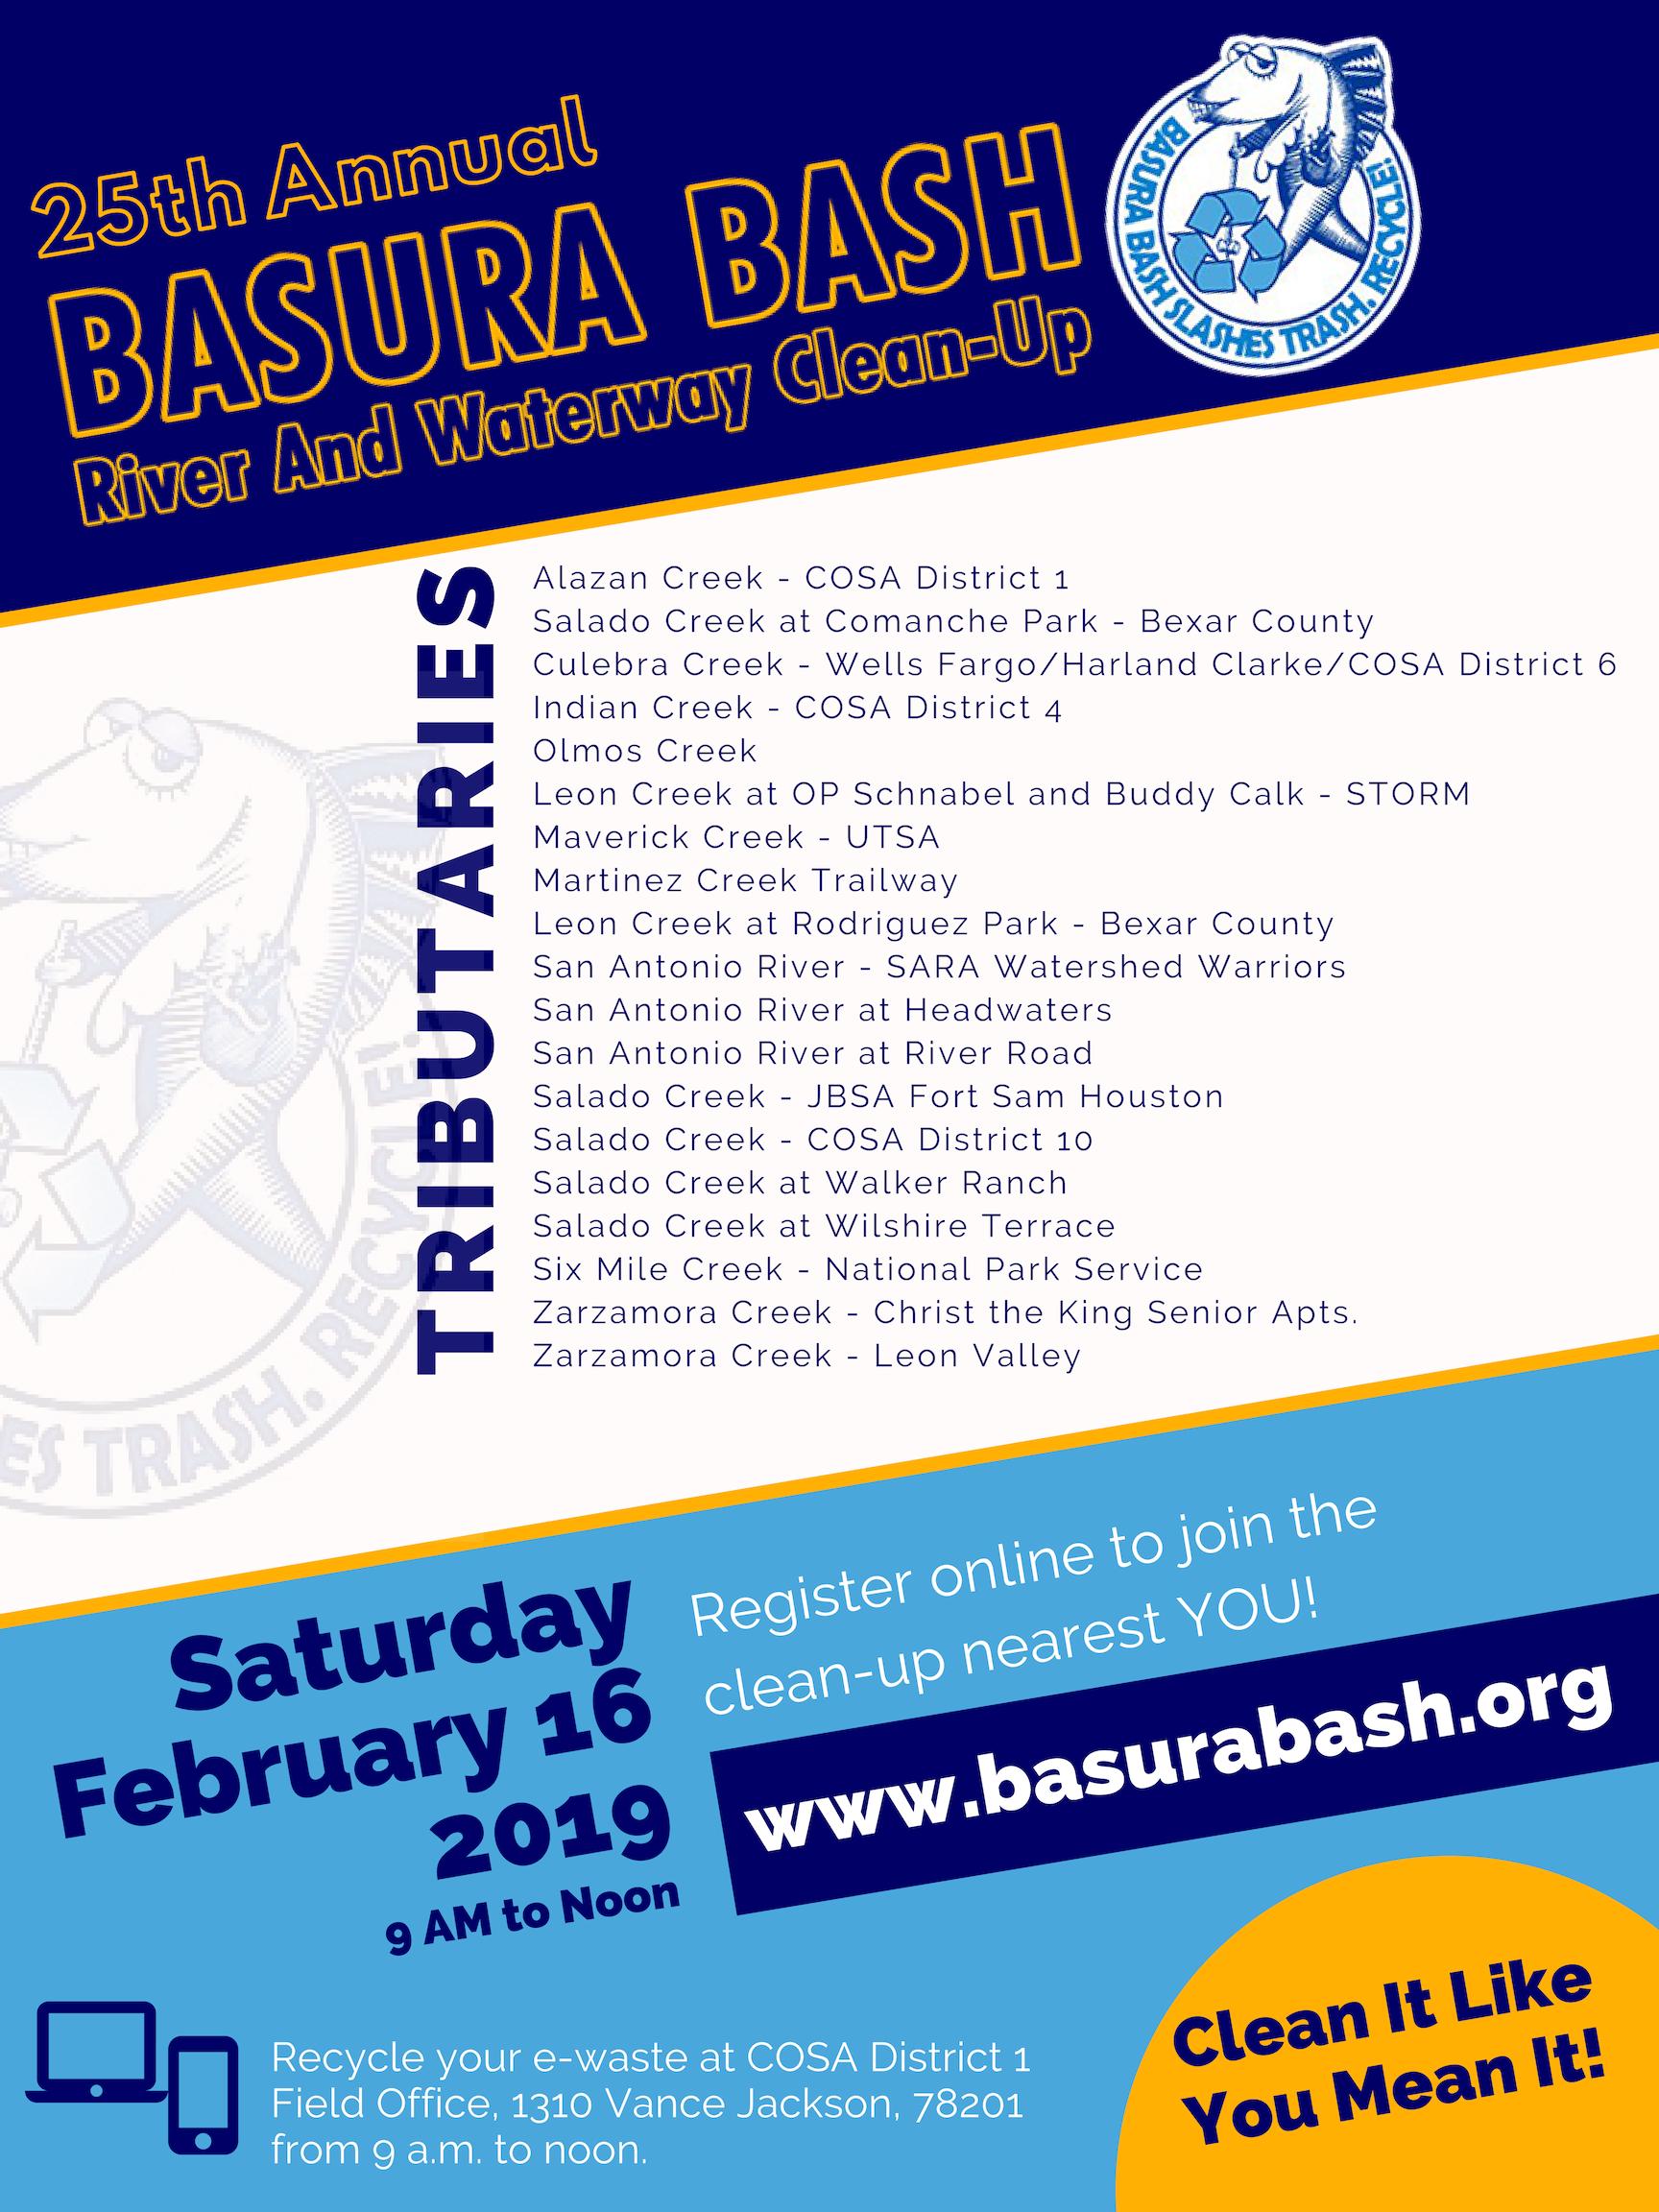 Basura Bash 2019 Flyer FINAL.png